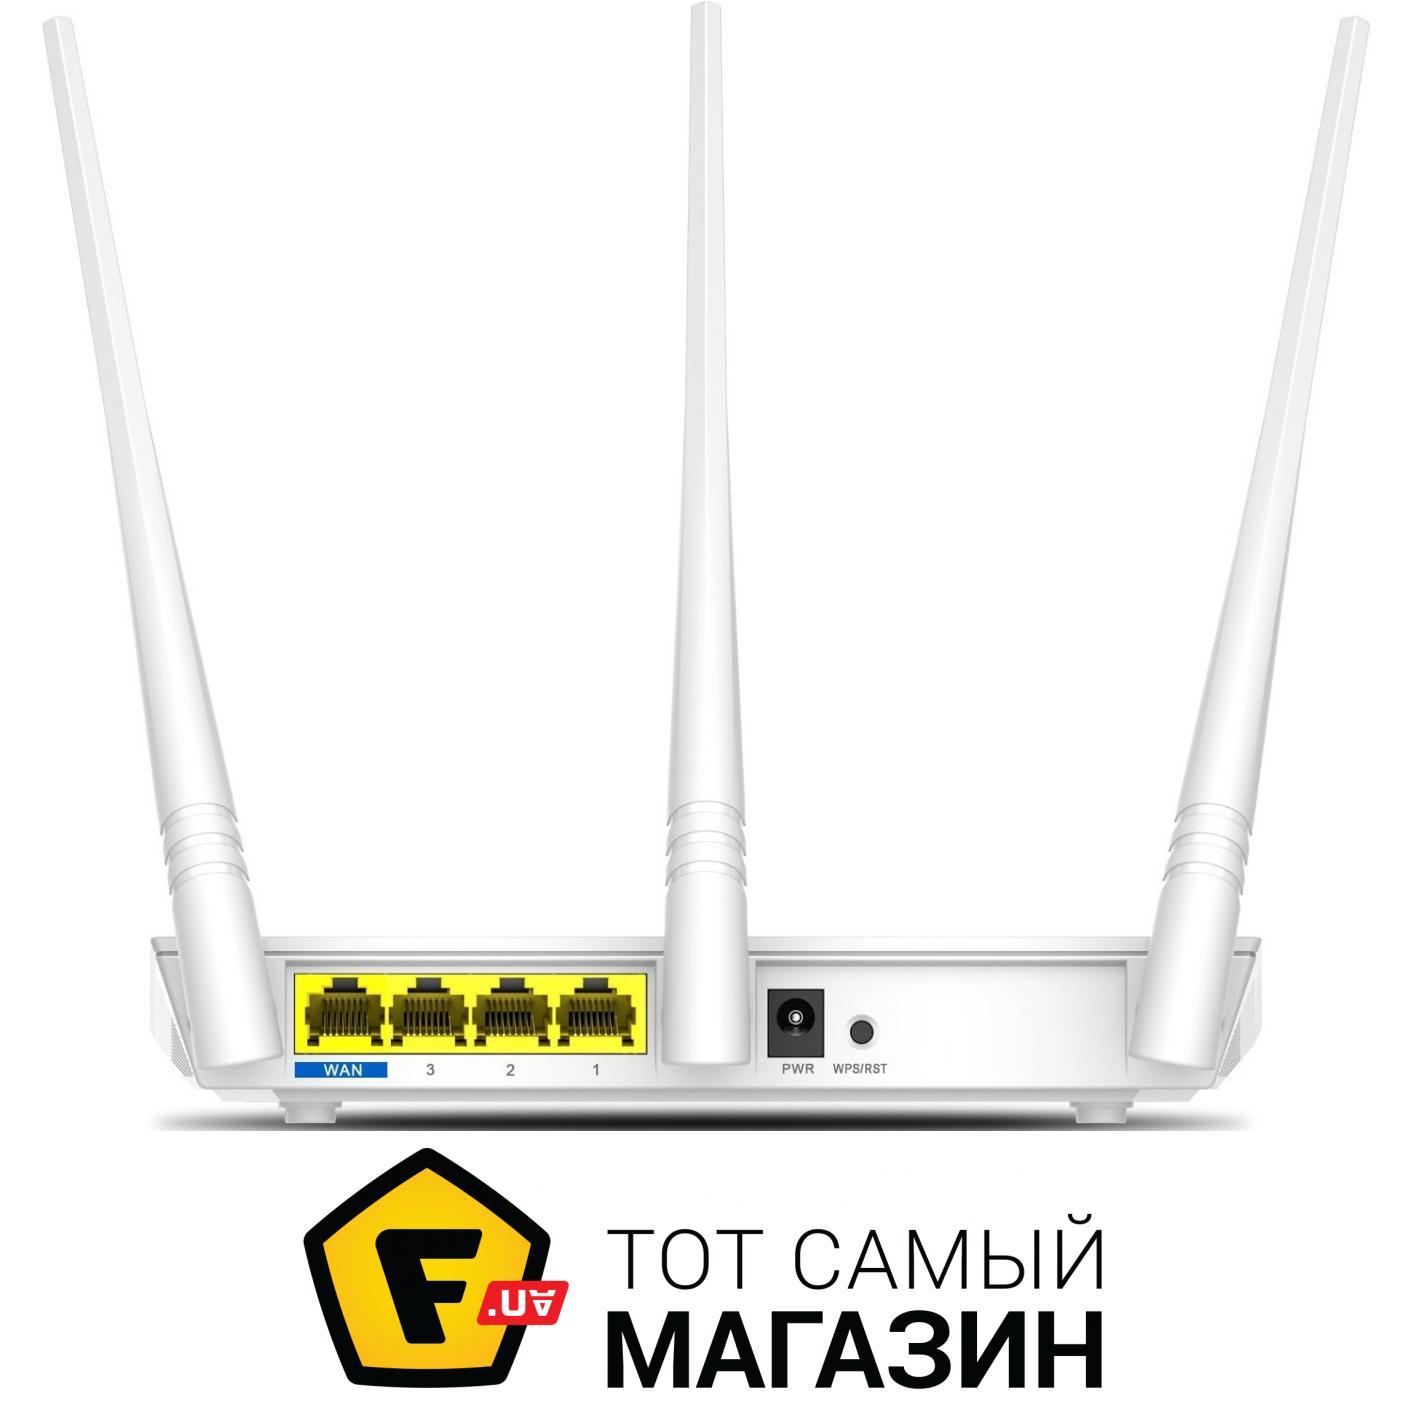 Маршрутизатор Tenda AC9 AC1200 Двухдиапазонный гигабитный Wi-Fi маршрутизатор